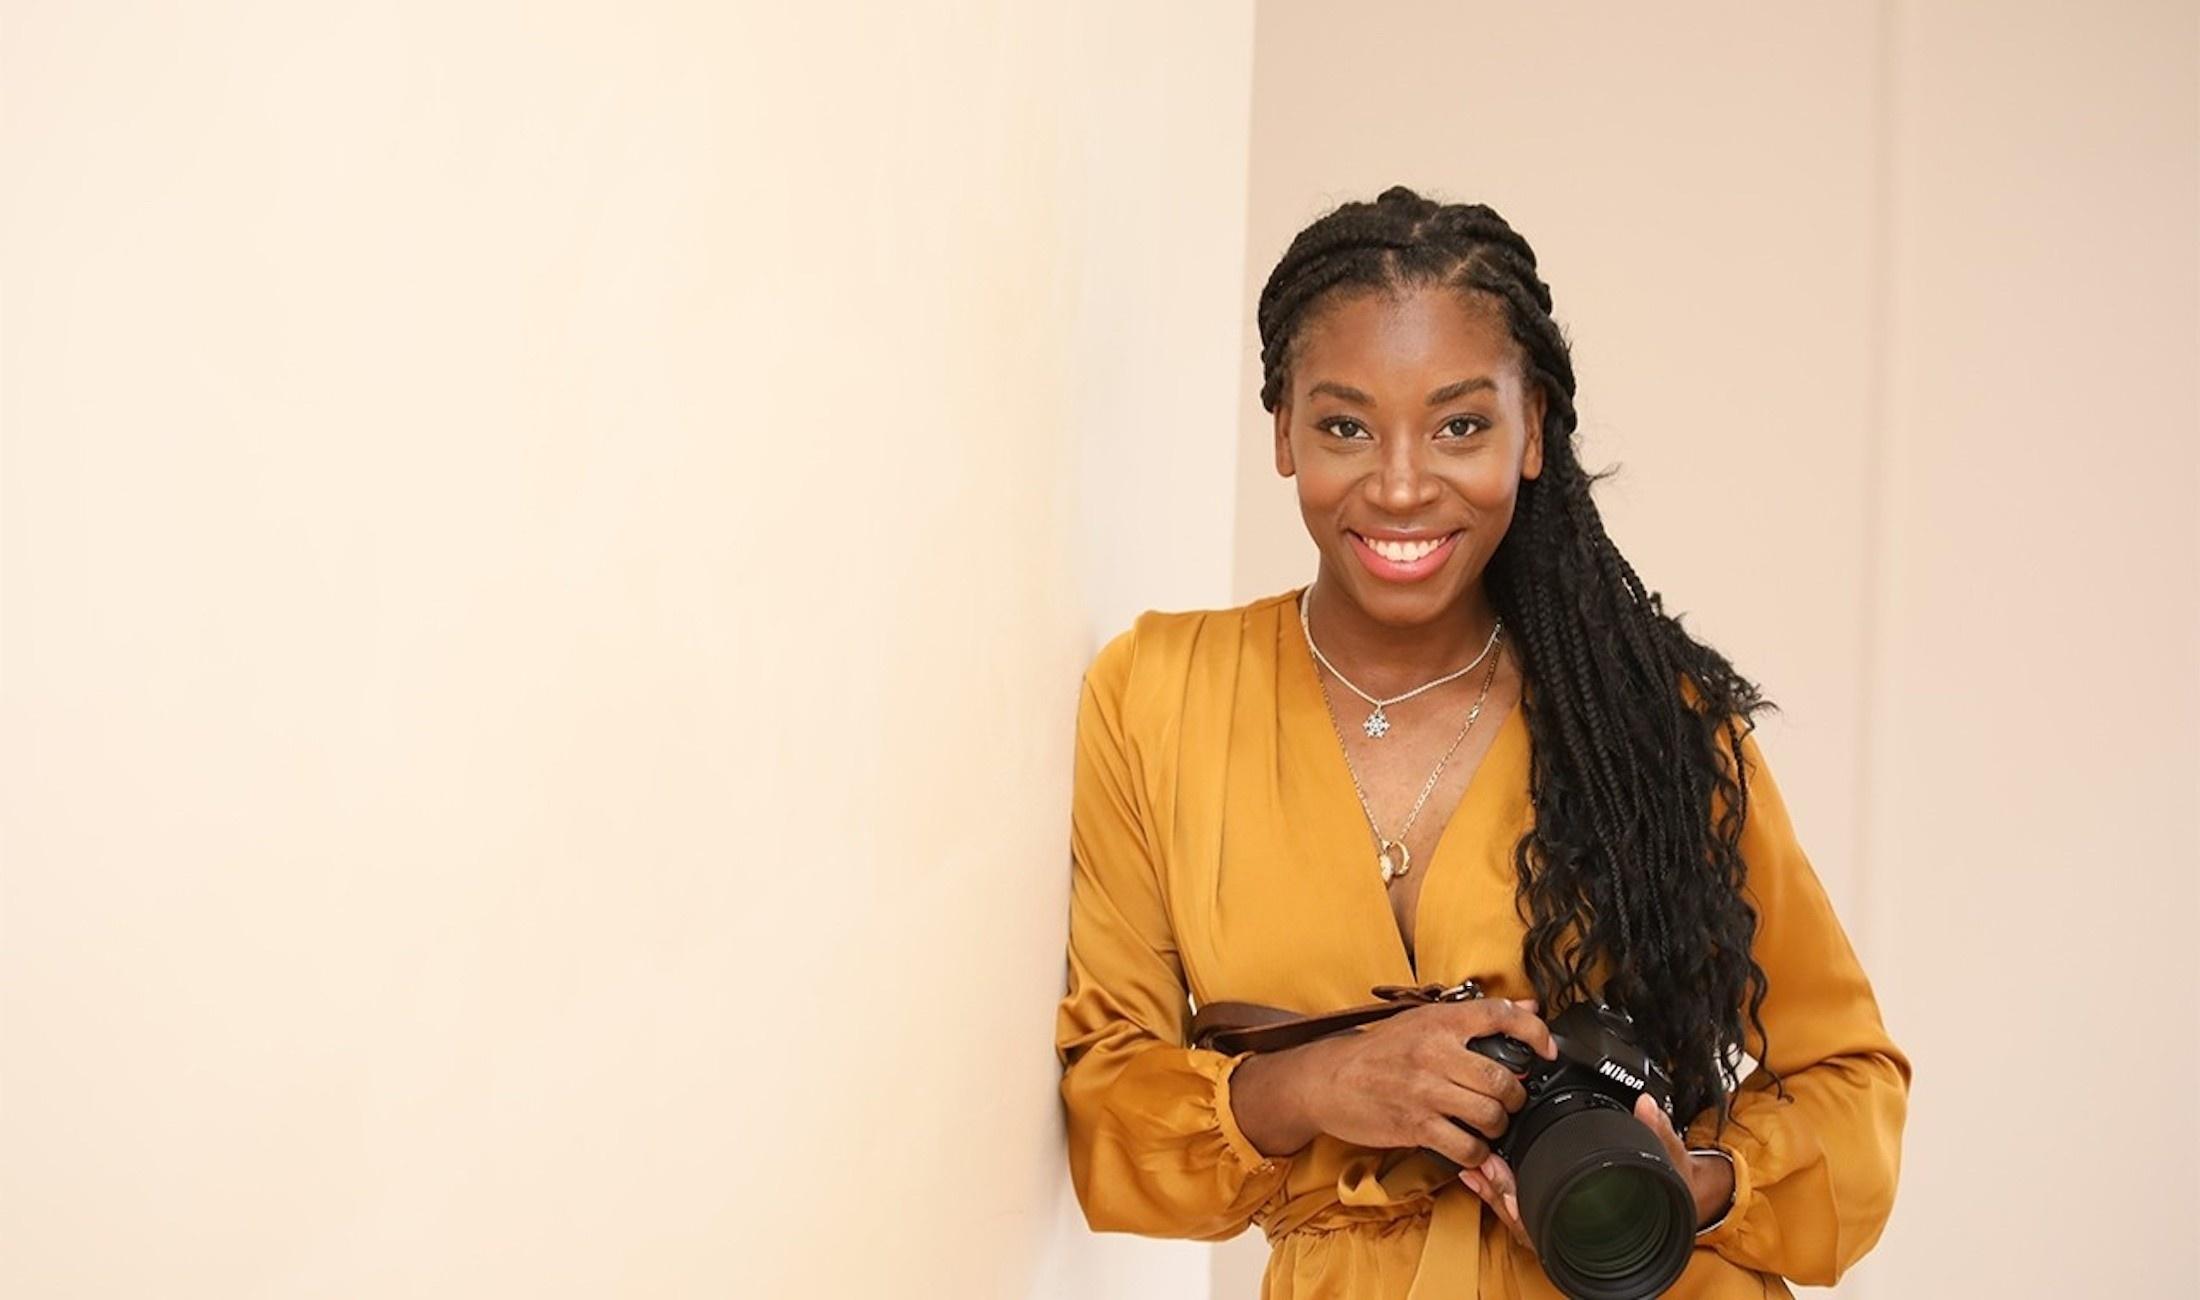 Tianna J-Williams Instructor APNPI Academy of Newborn Photography Courses